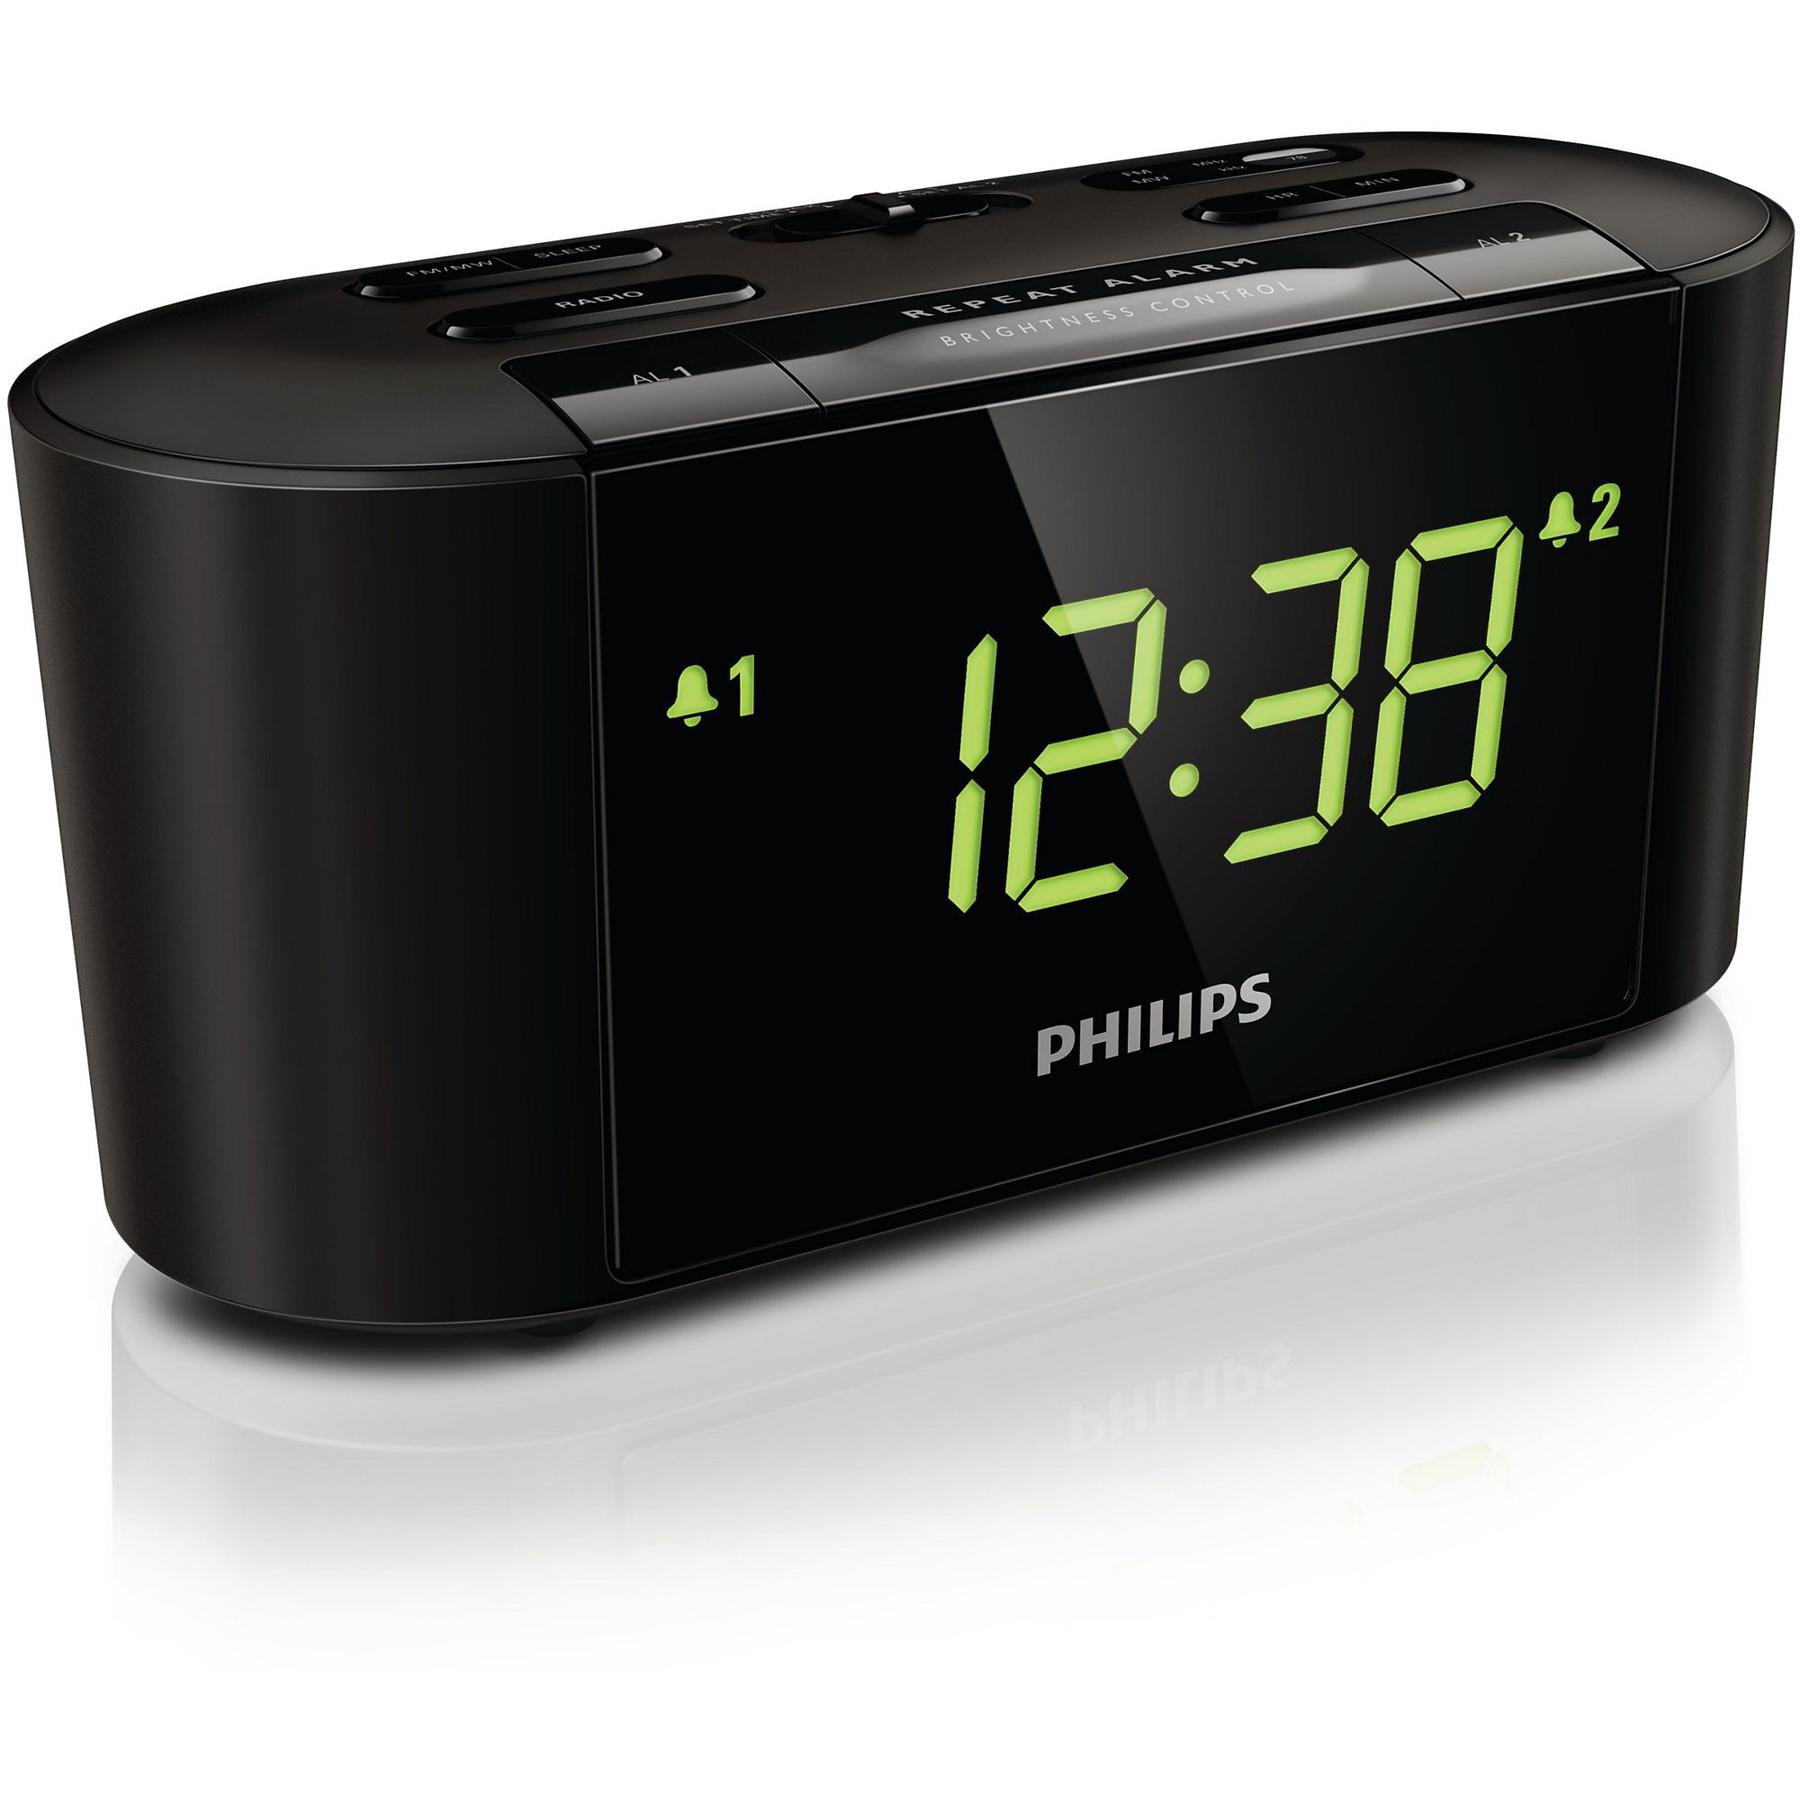 Radio & radio réveil Philips AJ3500 Radio réveil avec affichage grand taille